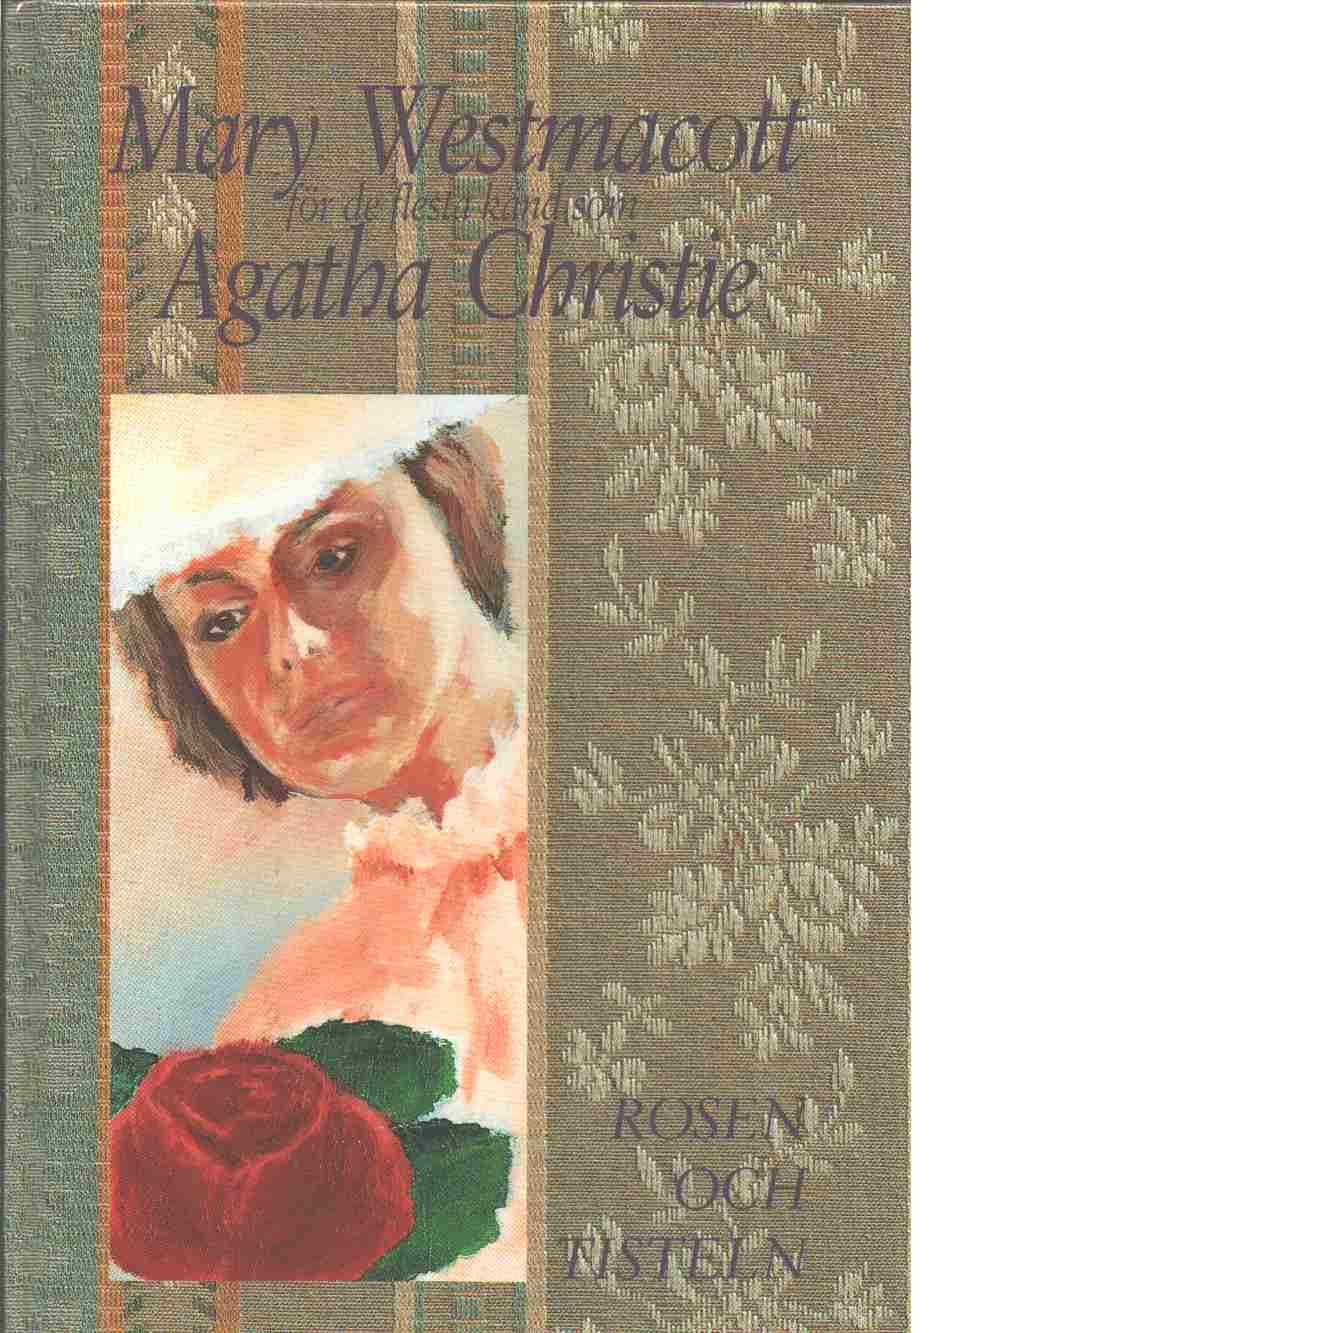 Rosen och tisteln - Christie, Agatha